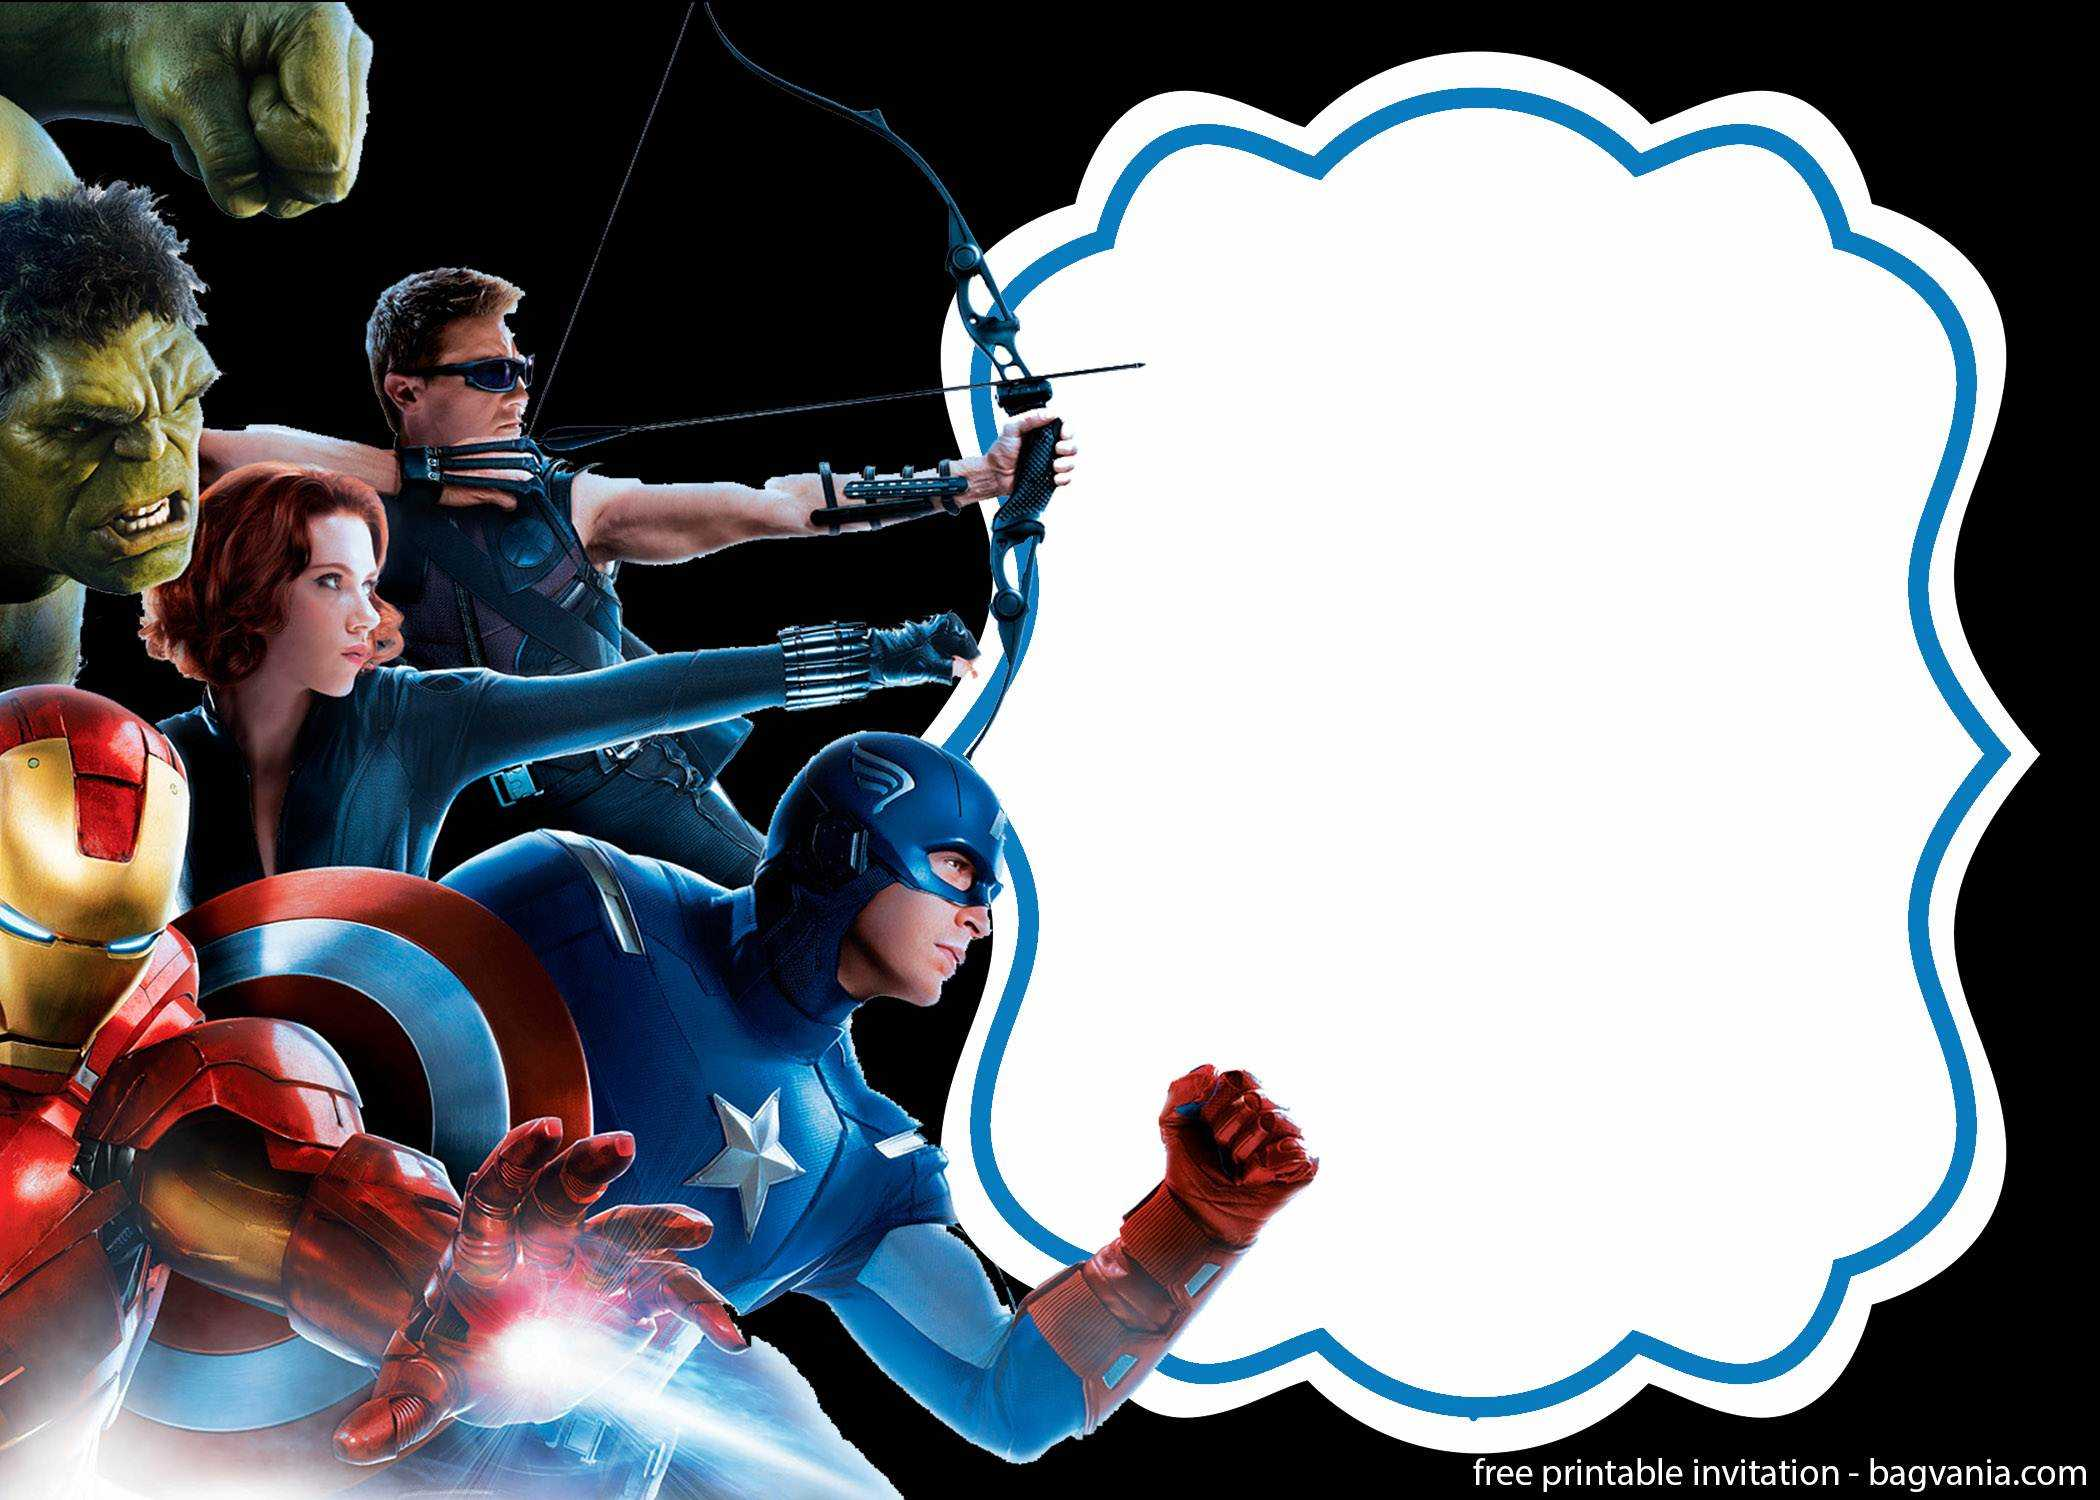 Free Printable The Avengers Invitation Template – Bagvania Pertaining To Avengers Birthday Card Template